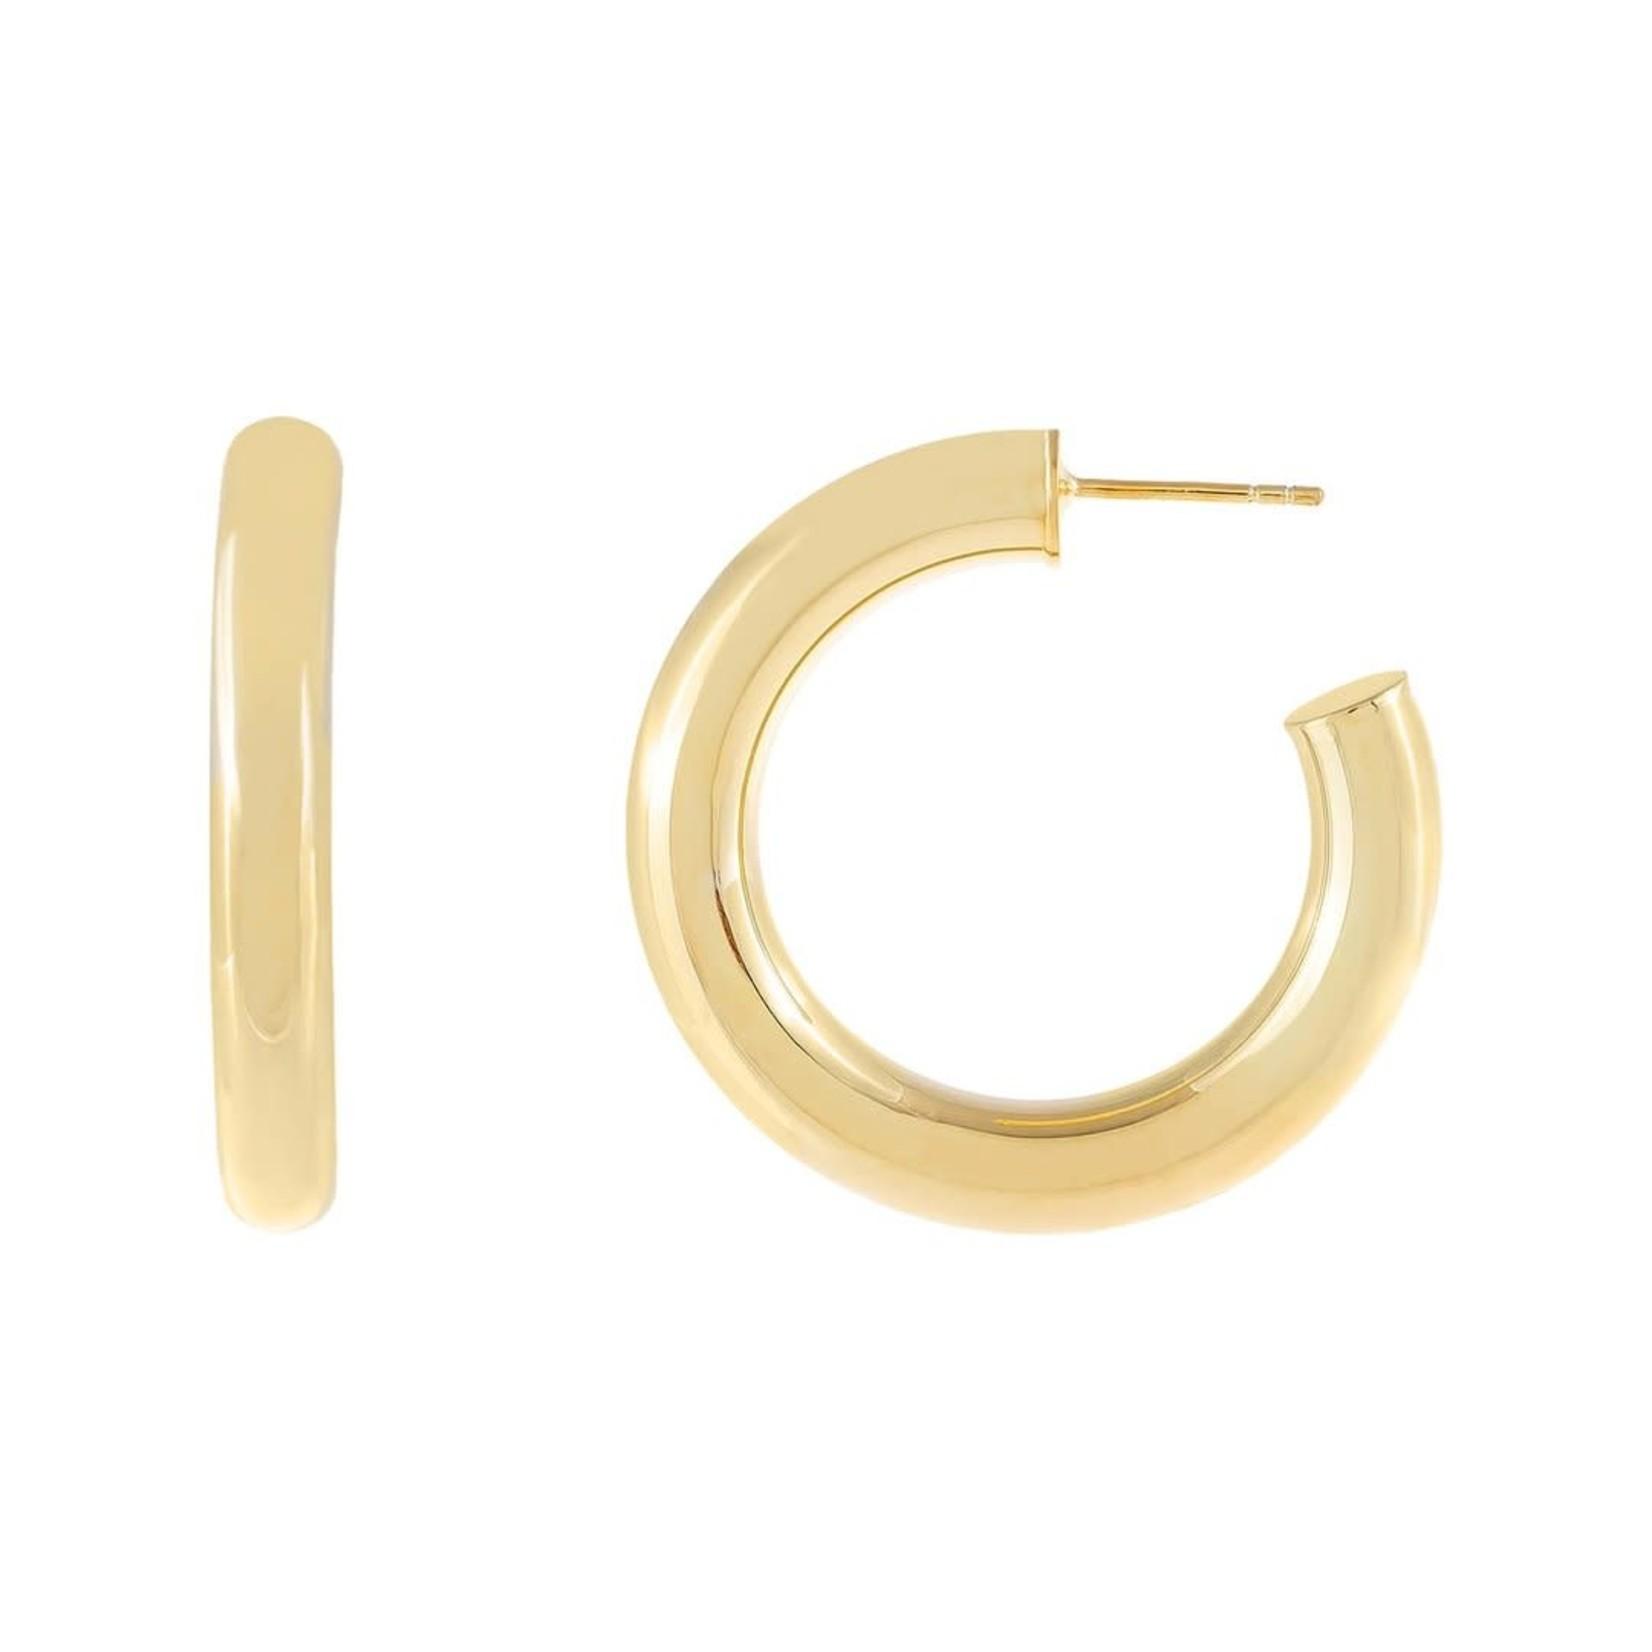 Adinas Tubular Hoop Earrings 35mm